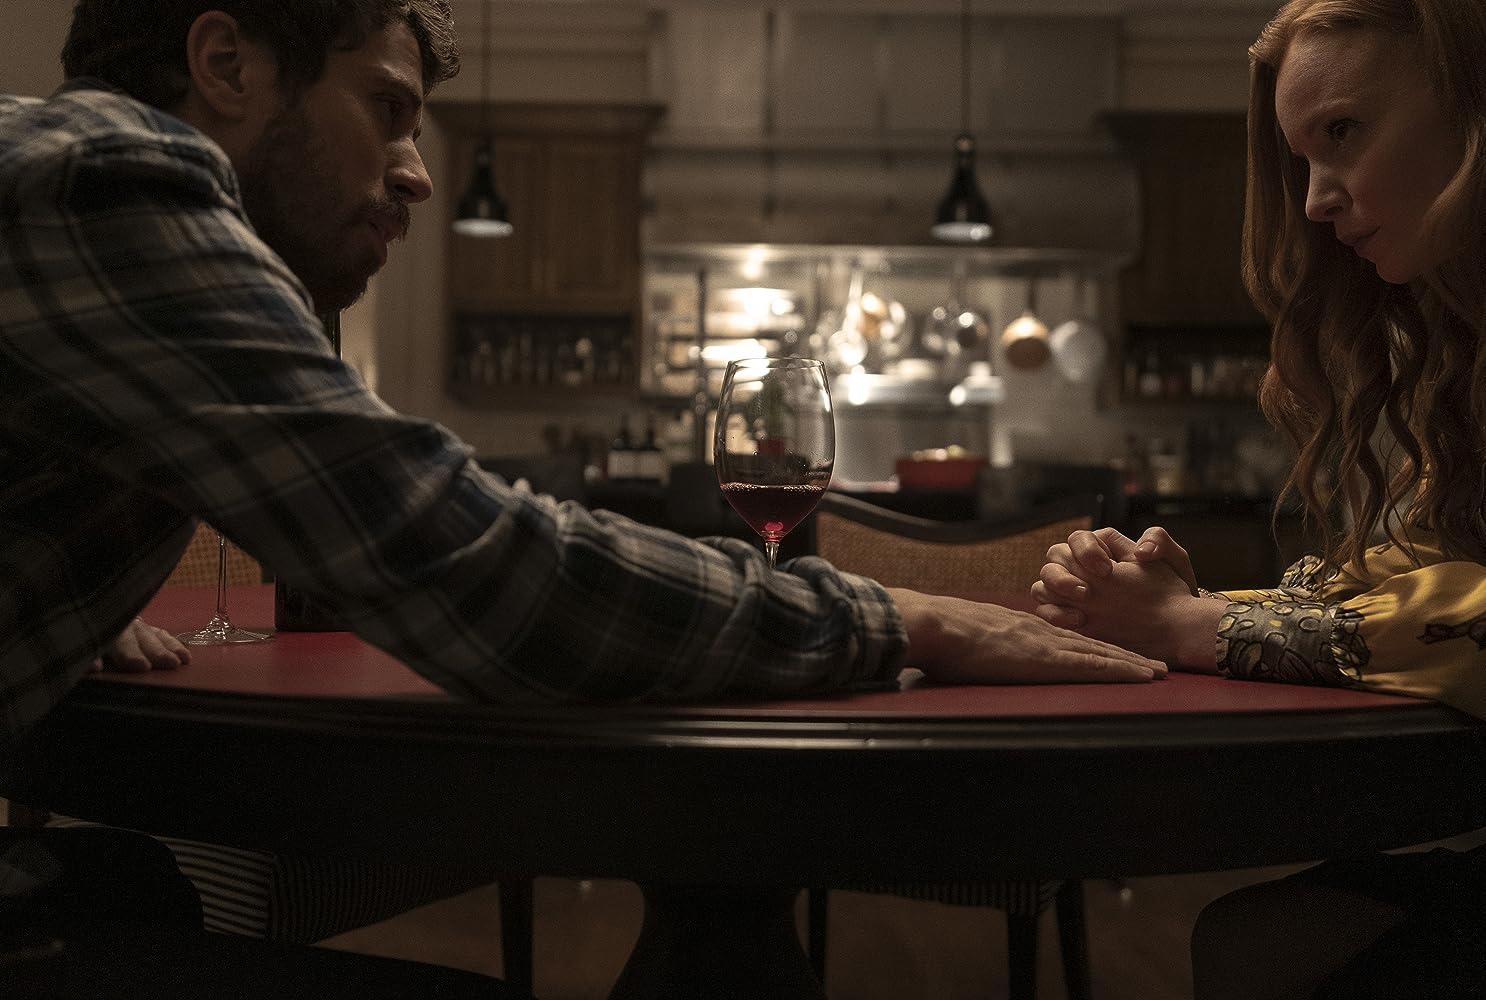 Lauren Ambrose and Toby Kebbell in Servant (2019)